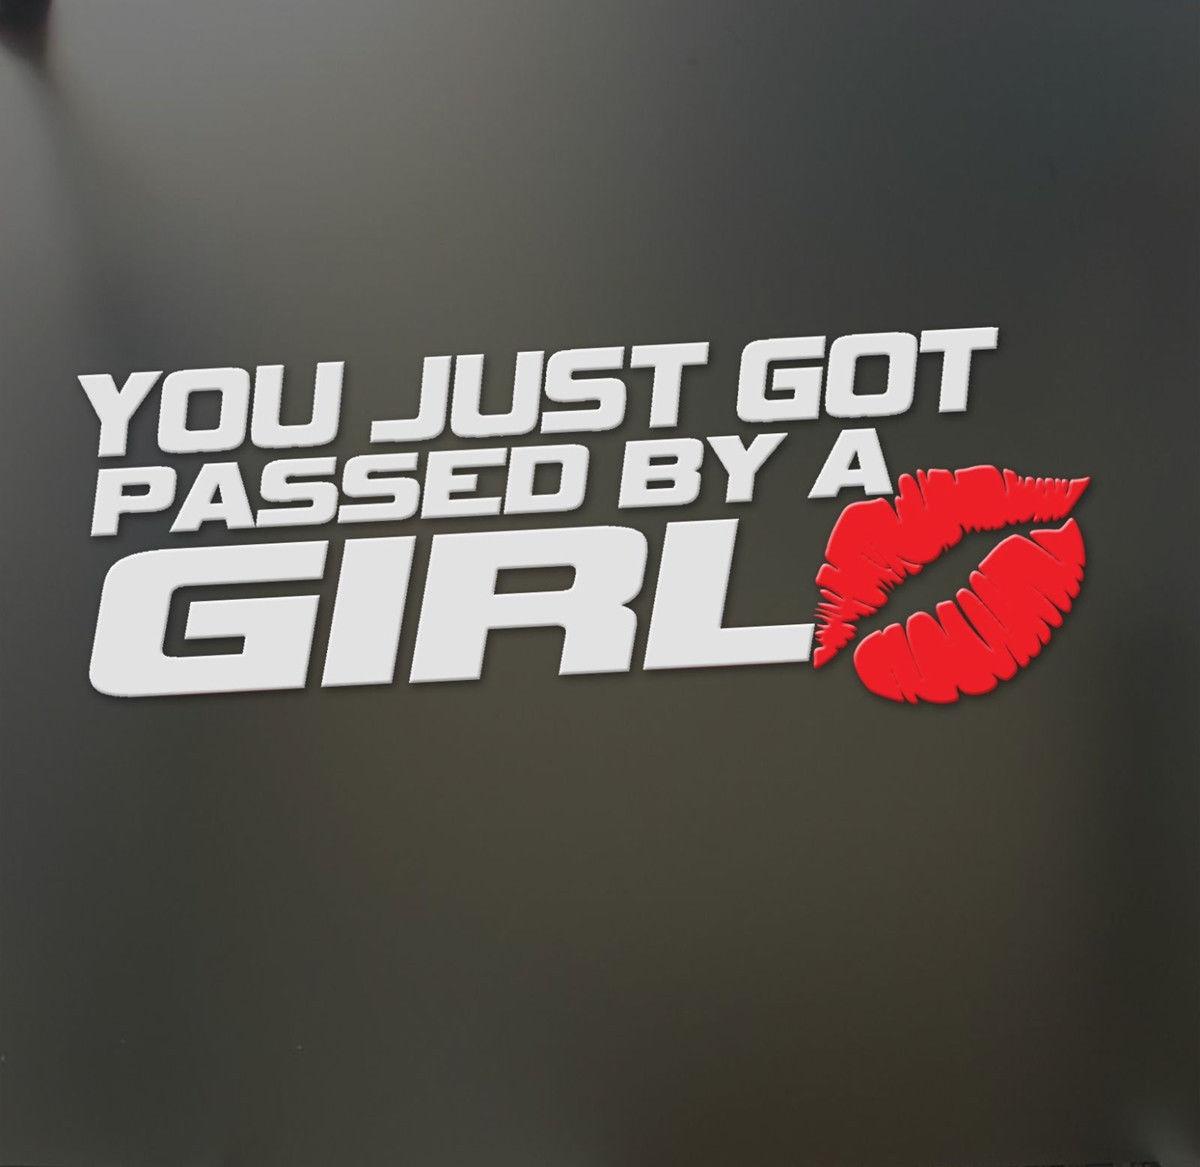 Car Sticker Decals Vinyl Girl Custom Vinyl Decals - Car sticker decals vinyl girl